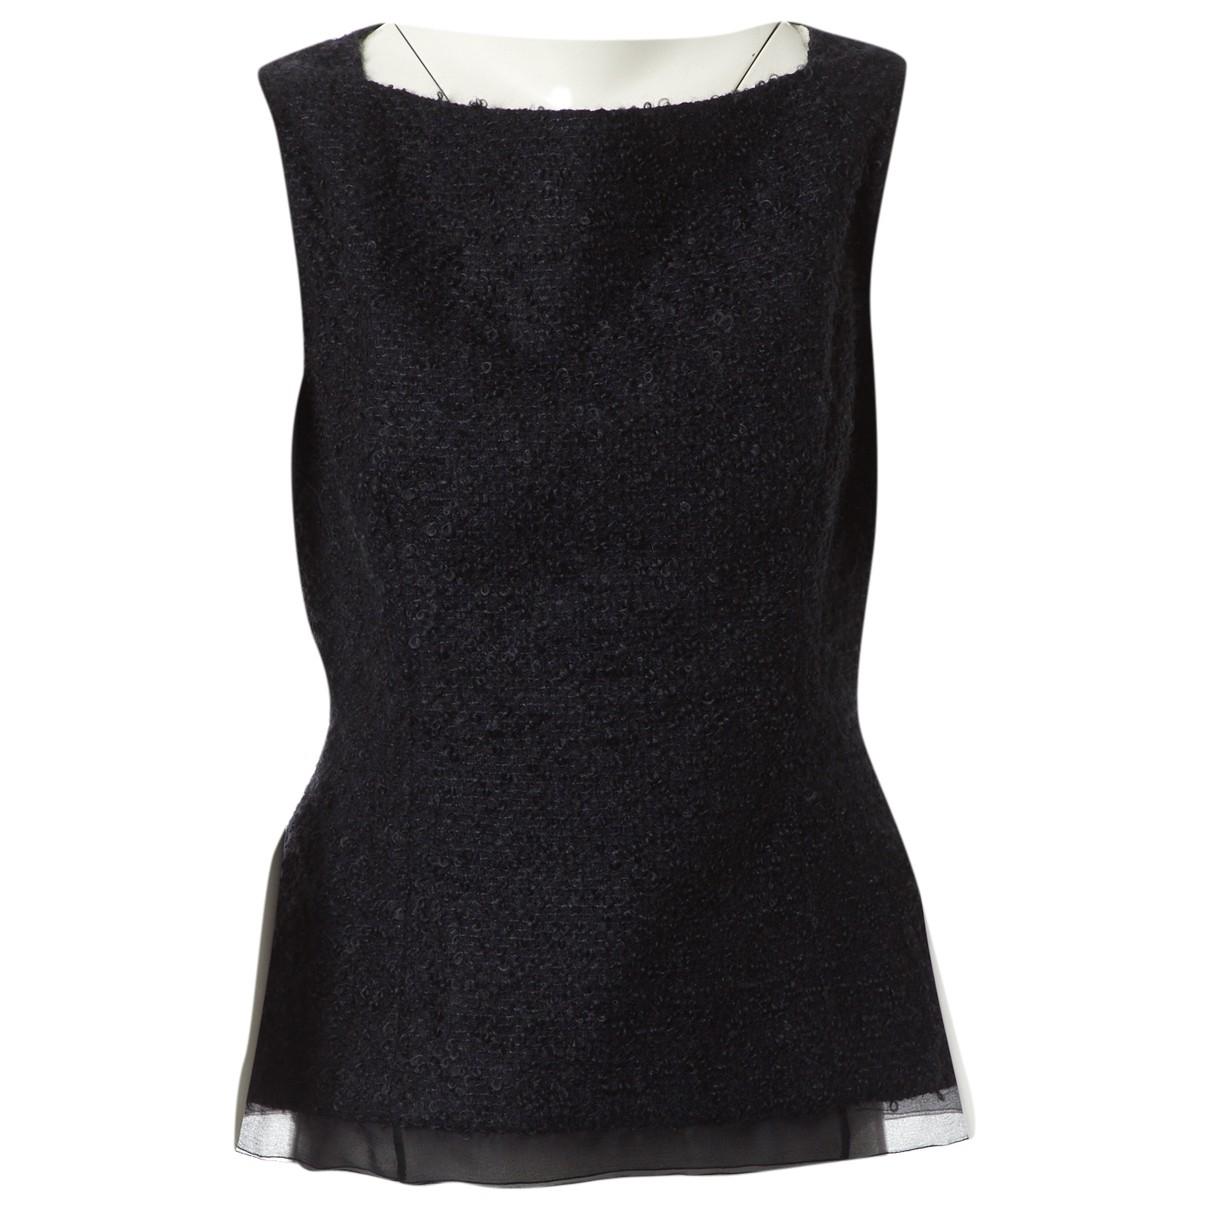 Camiseta de tirantes Tweed Dior